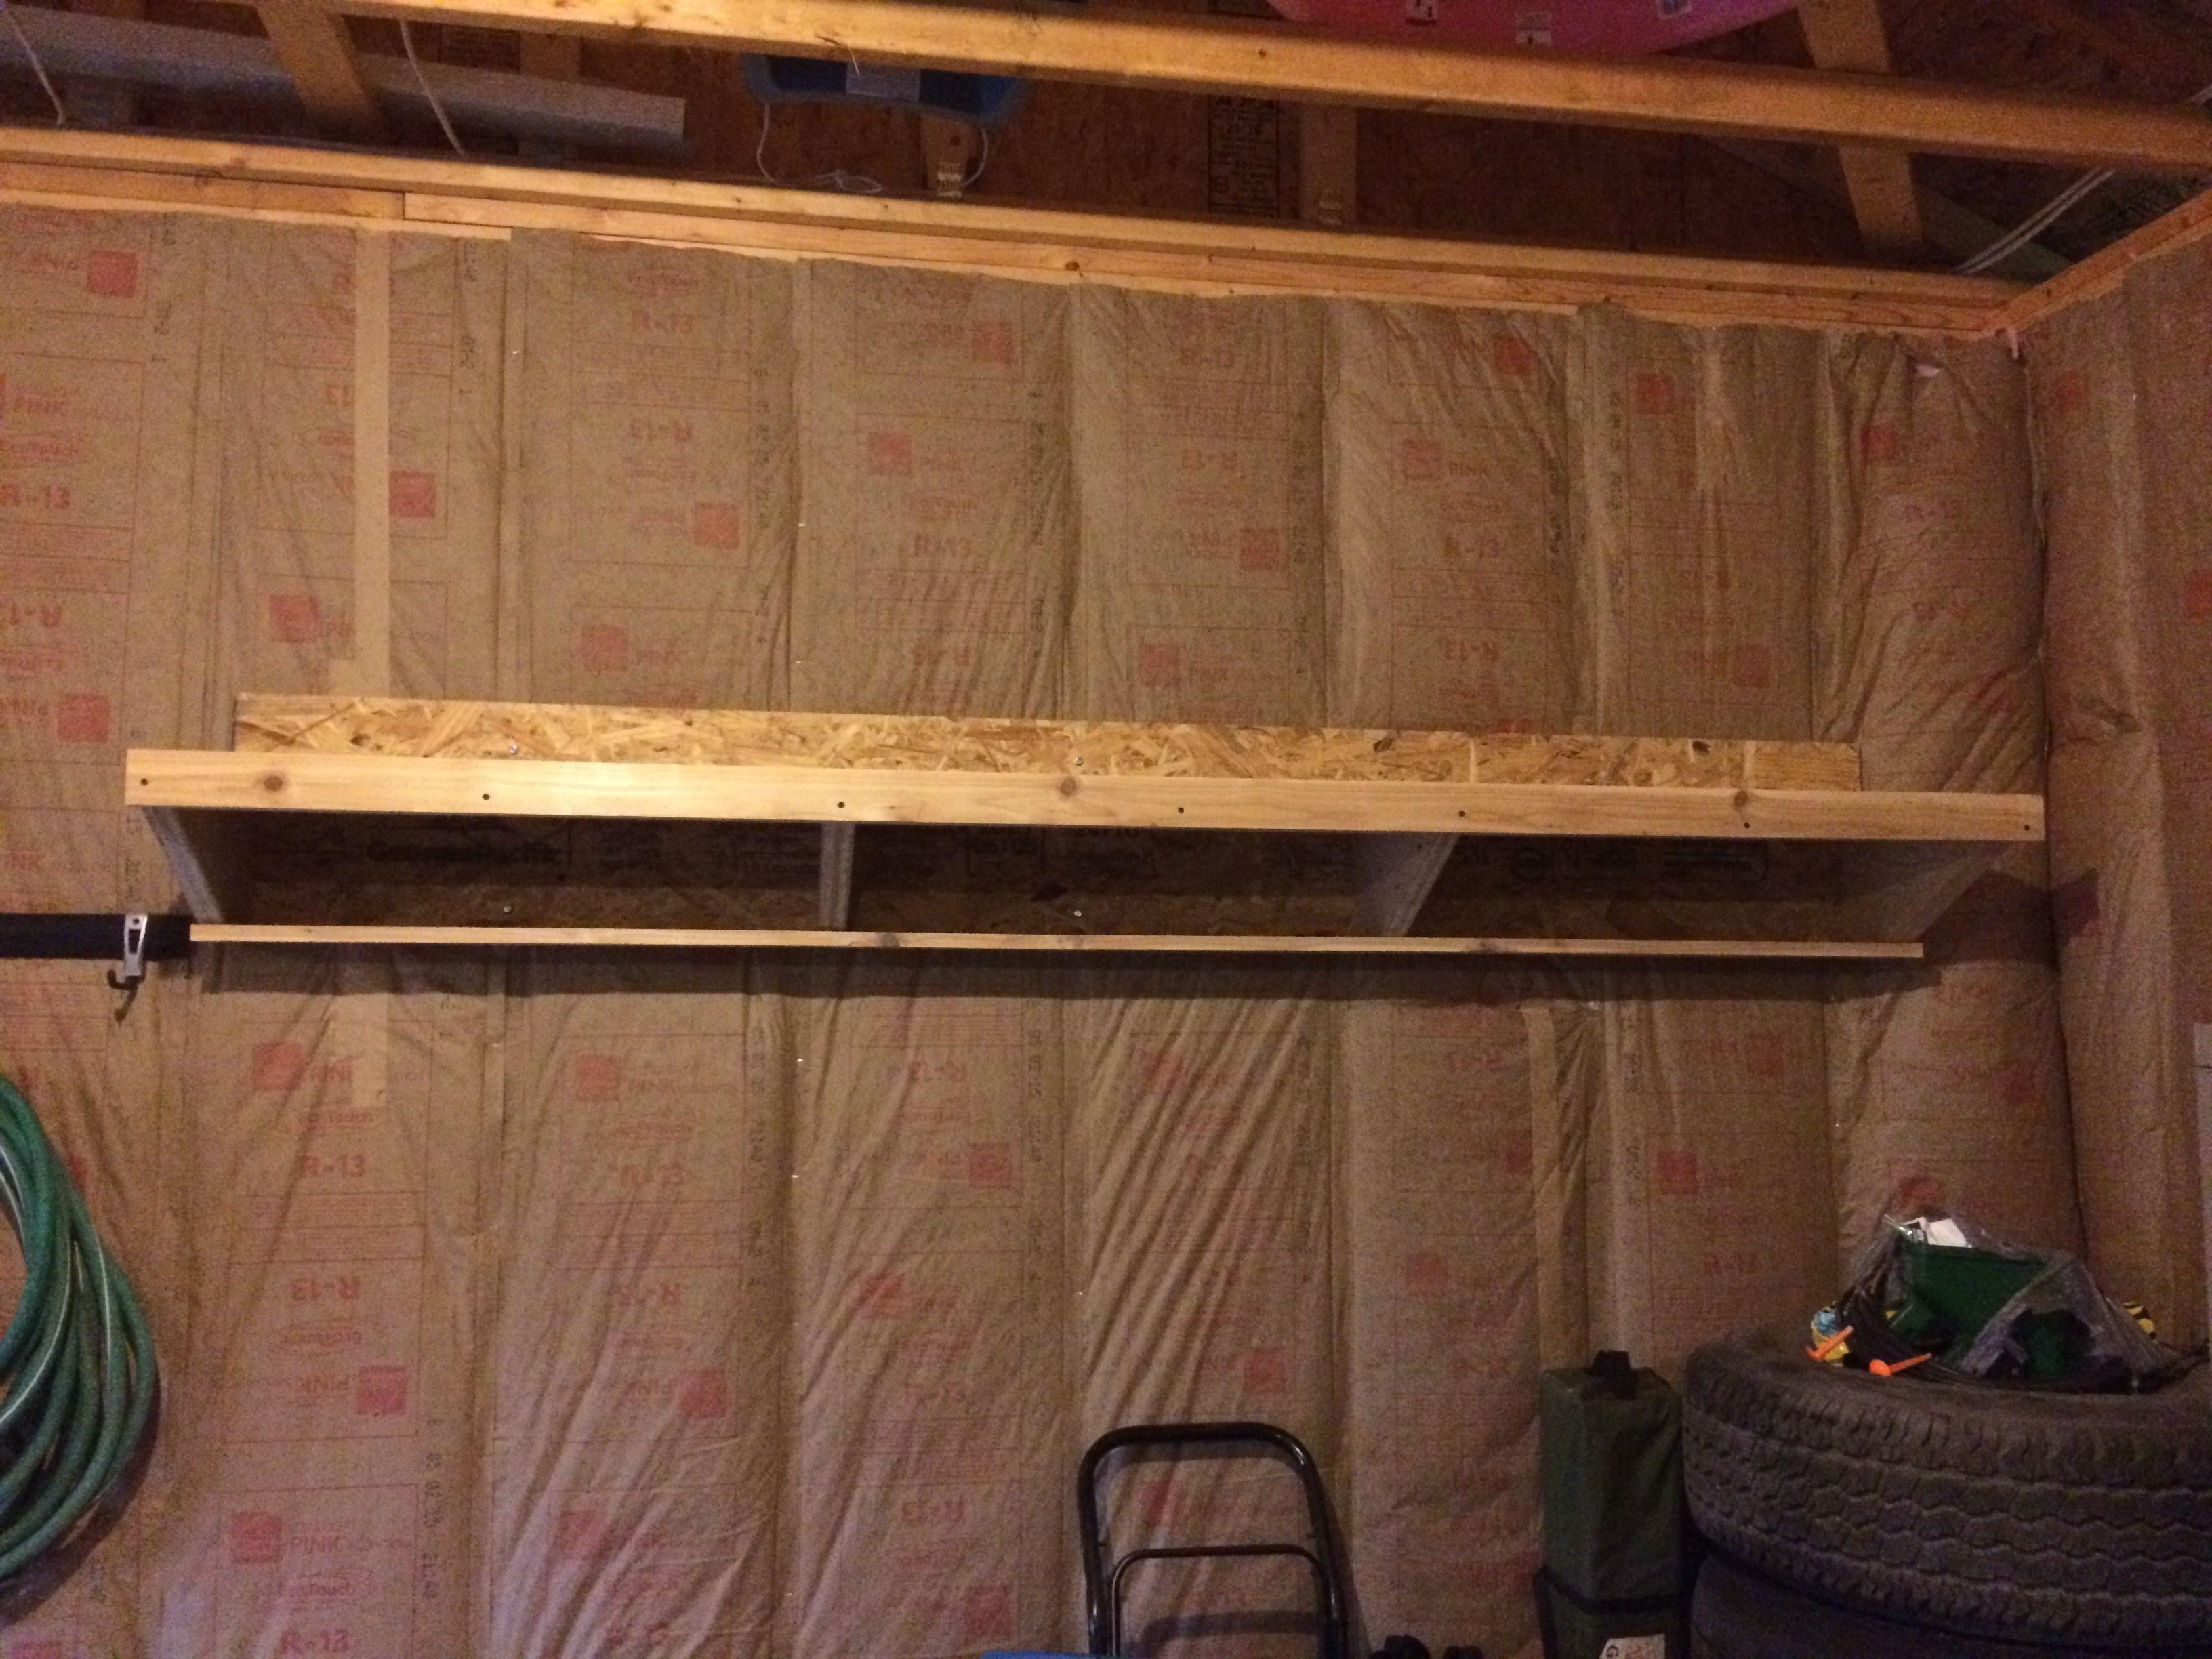 Double Decker Garage Storage Shelves & Double Decker Garage Storage Shelves | Garage storage shelves